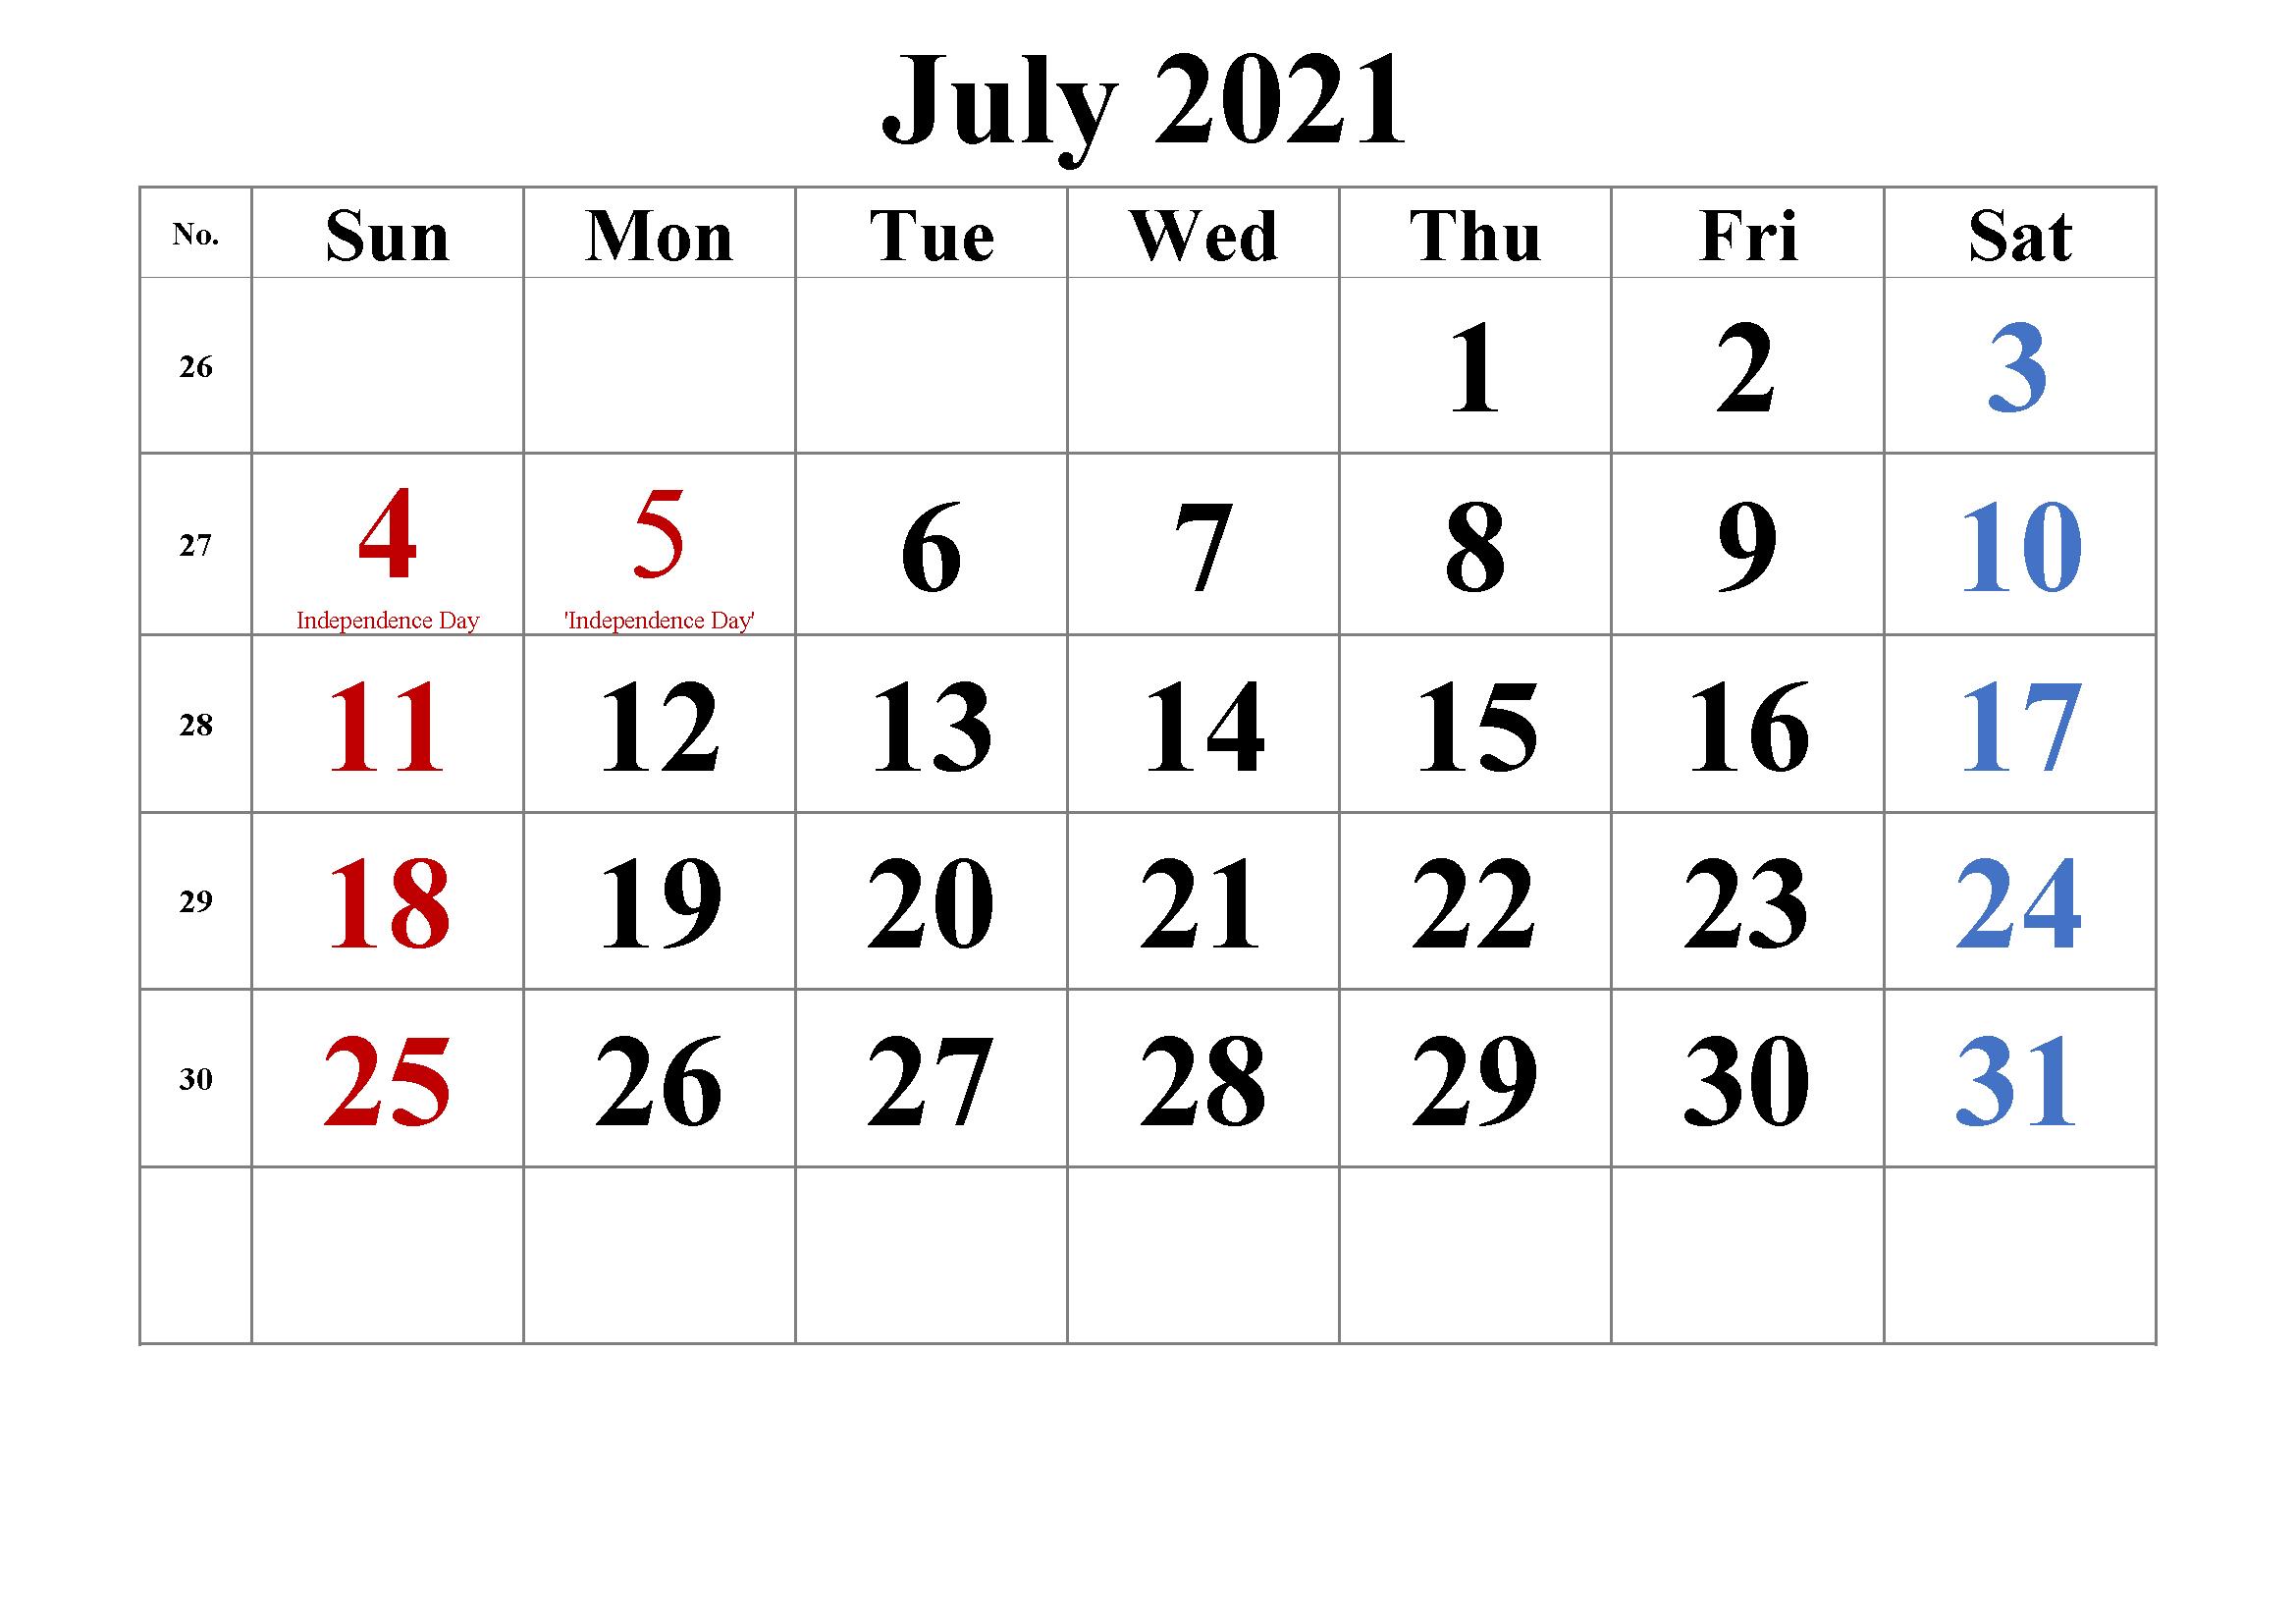 July 2021 Calendar Printable Wiki